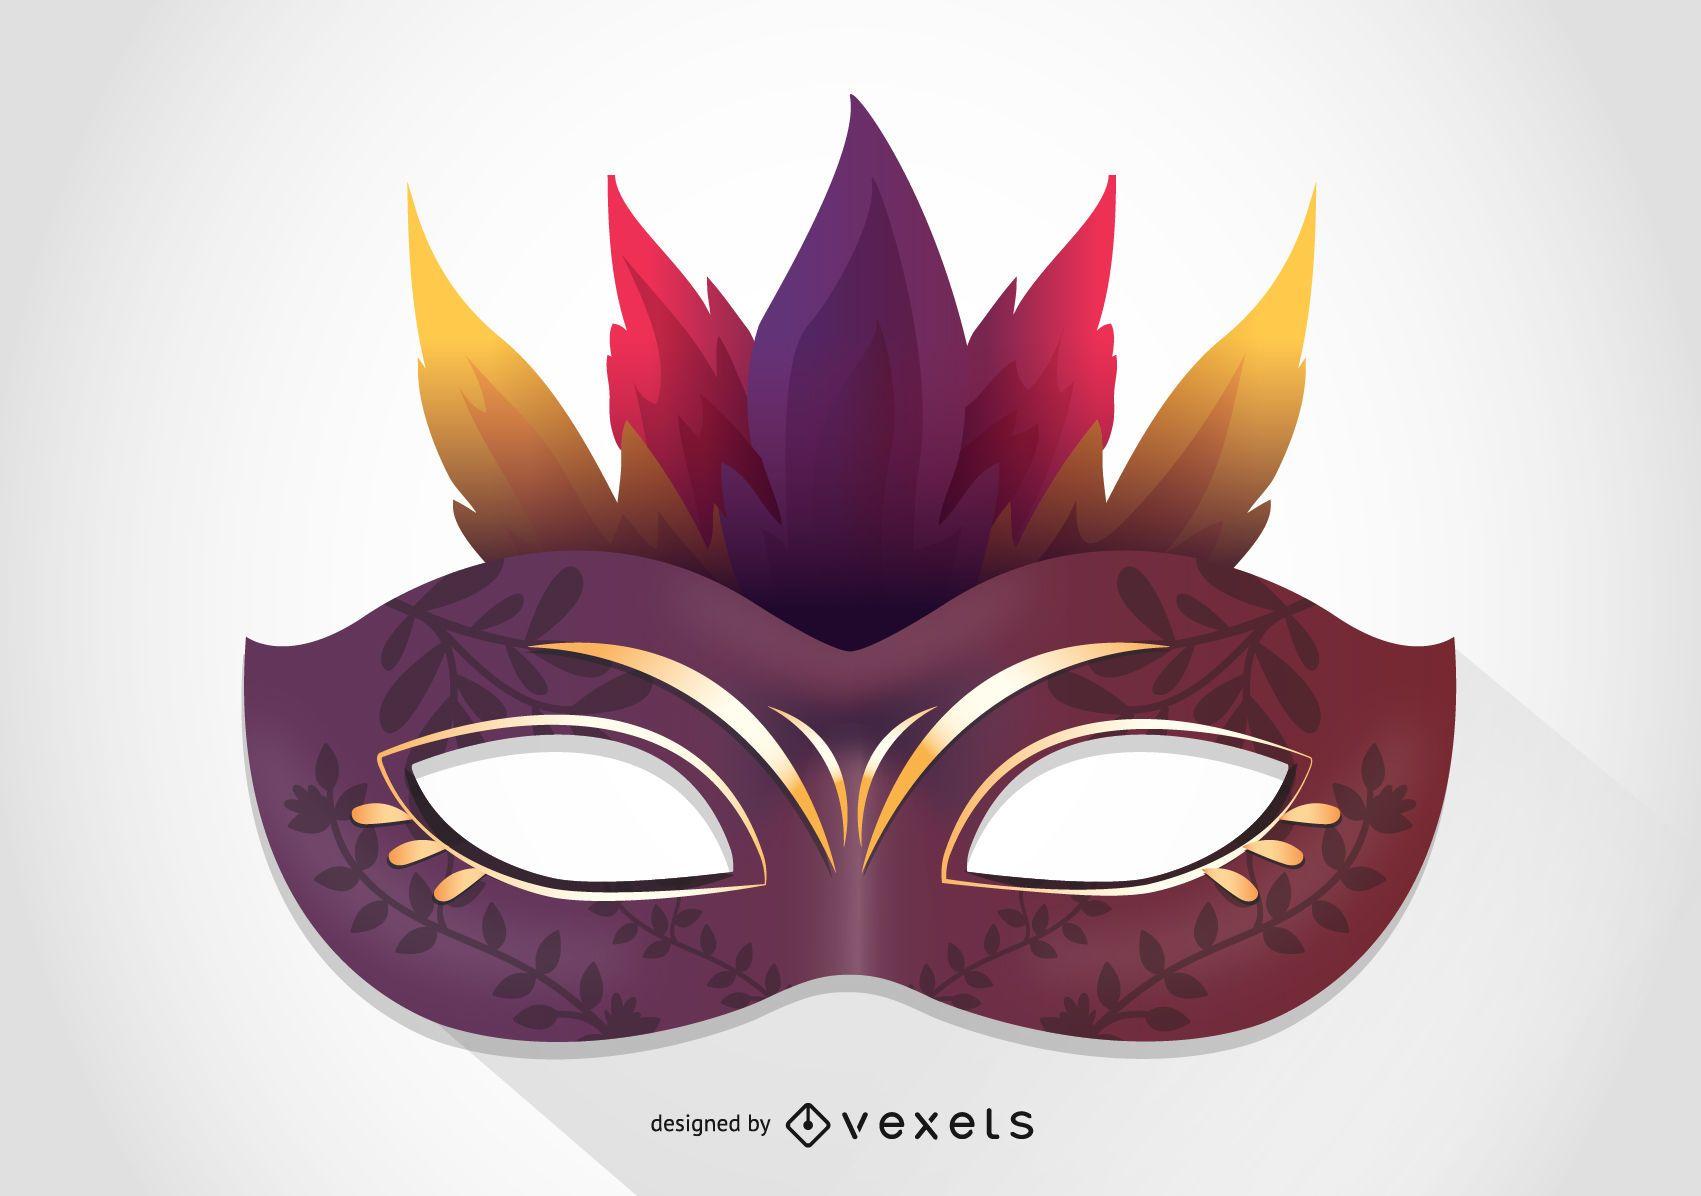 Illustrated Venice carnival mask